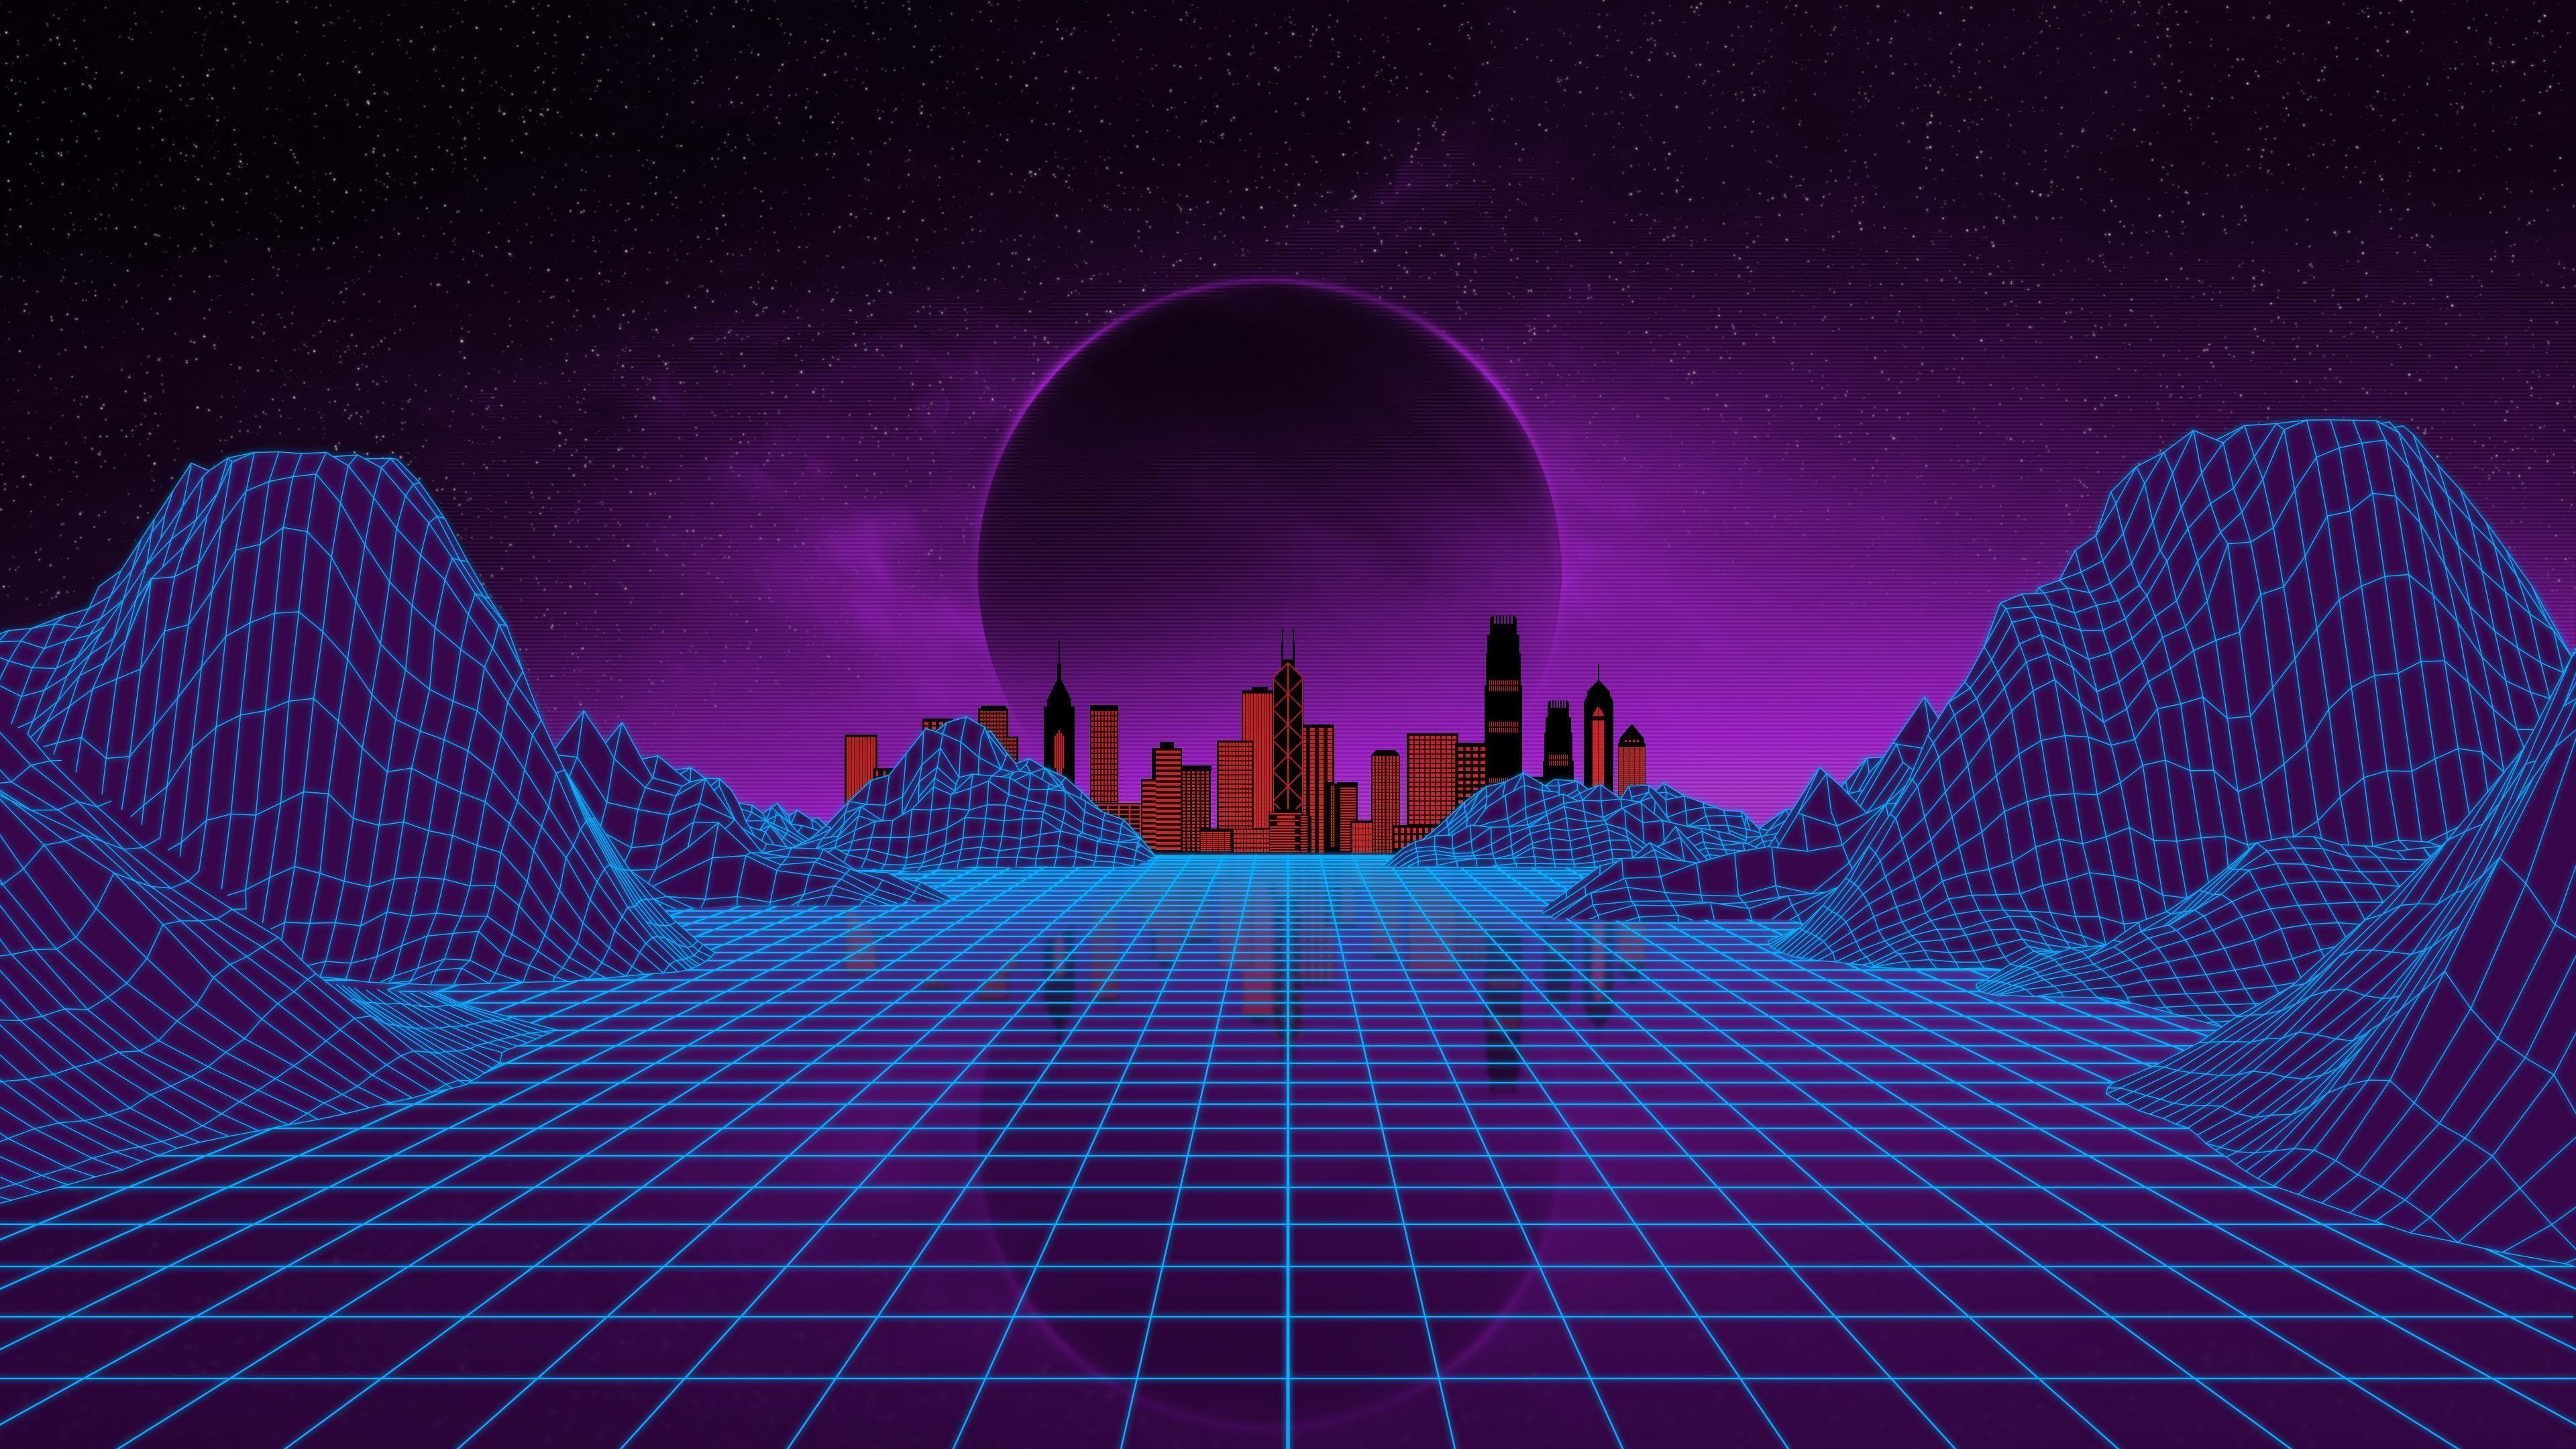 Aesthetic Space Wallpaper Hd